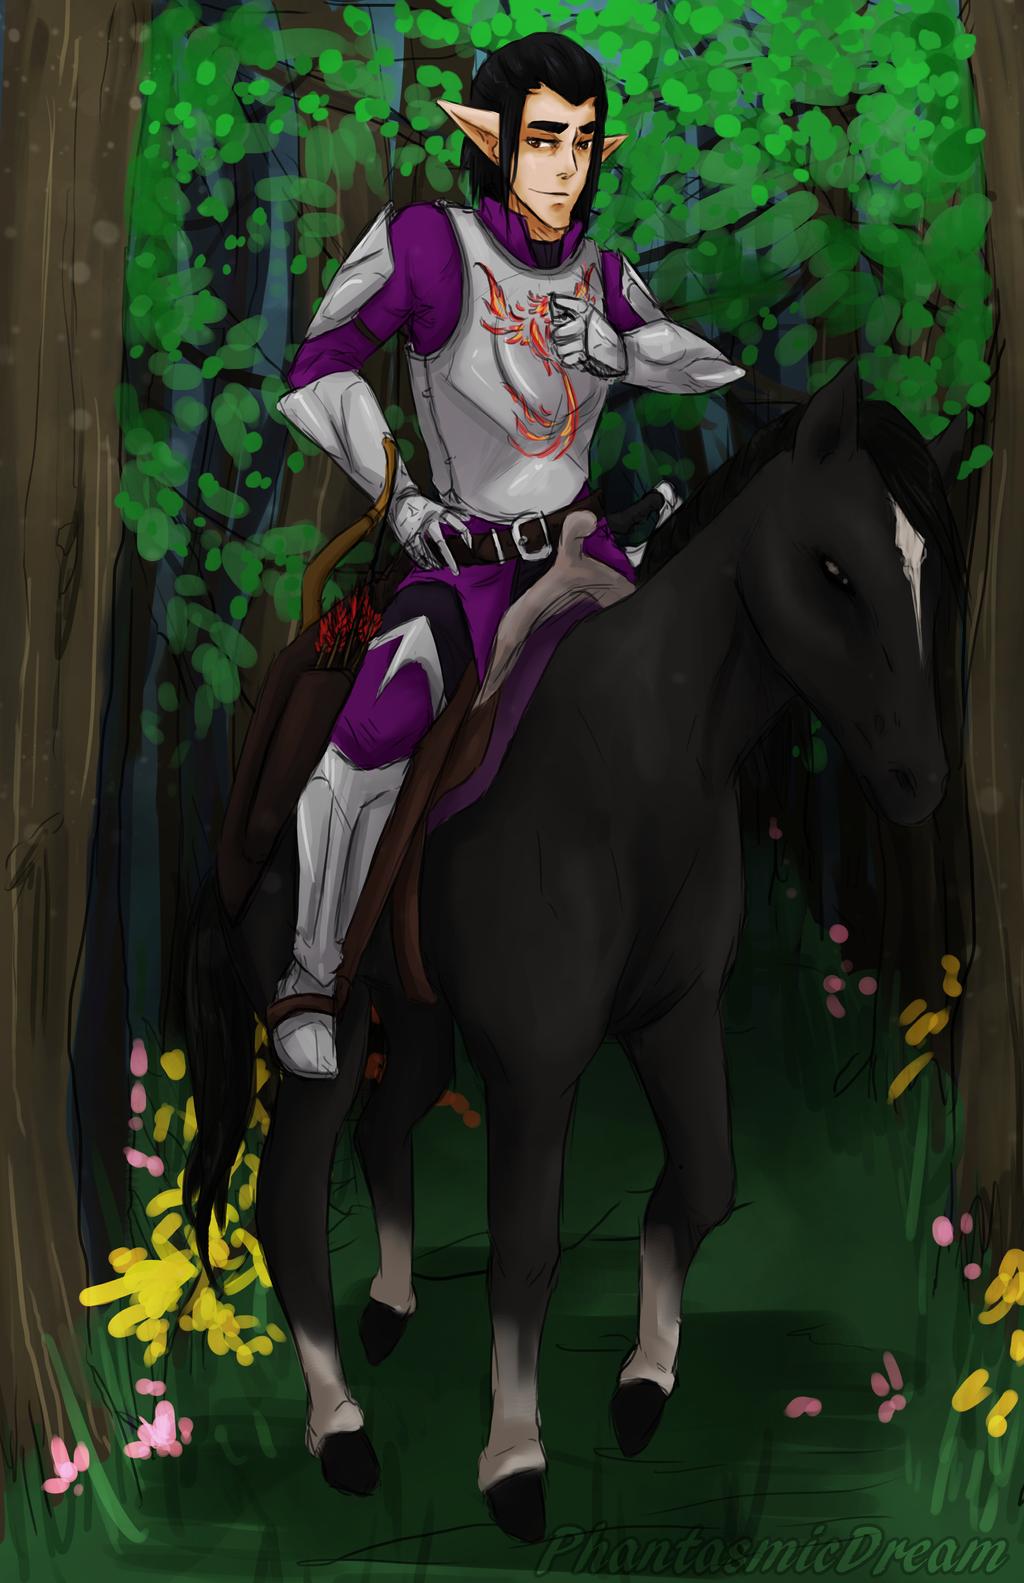 co__on_a_horse_by_phantasmicdream-dbnyfa